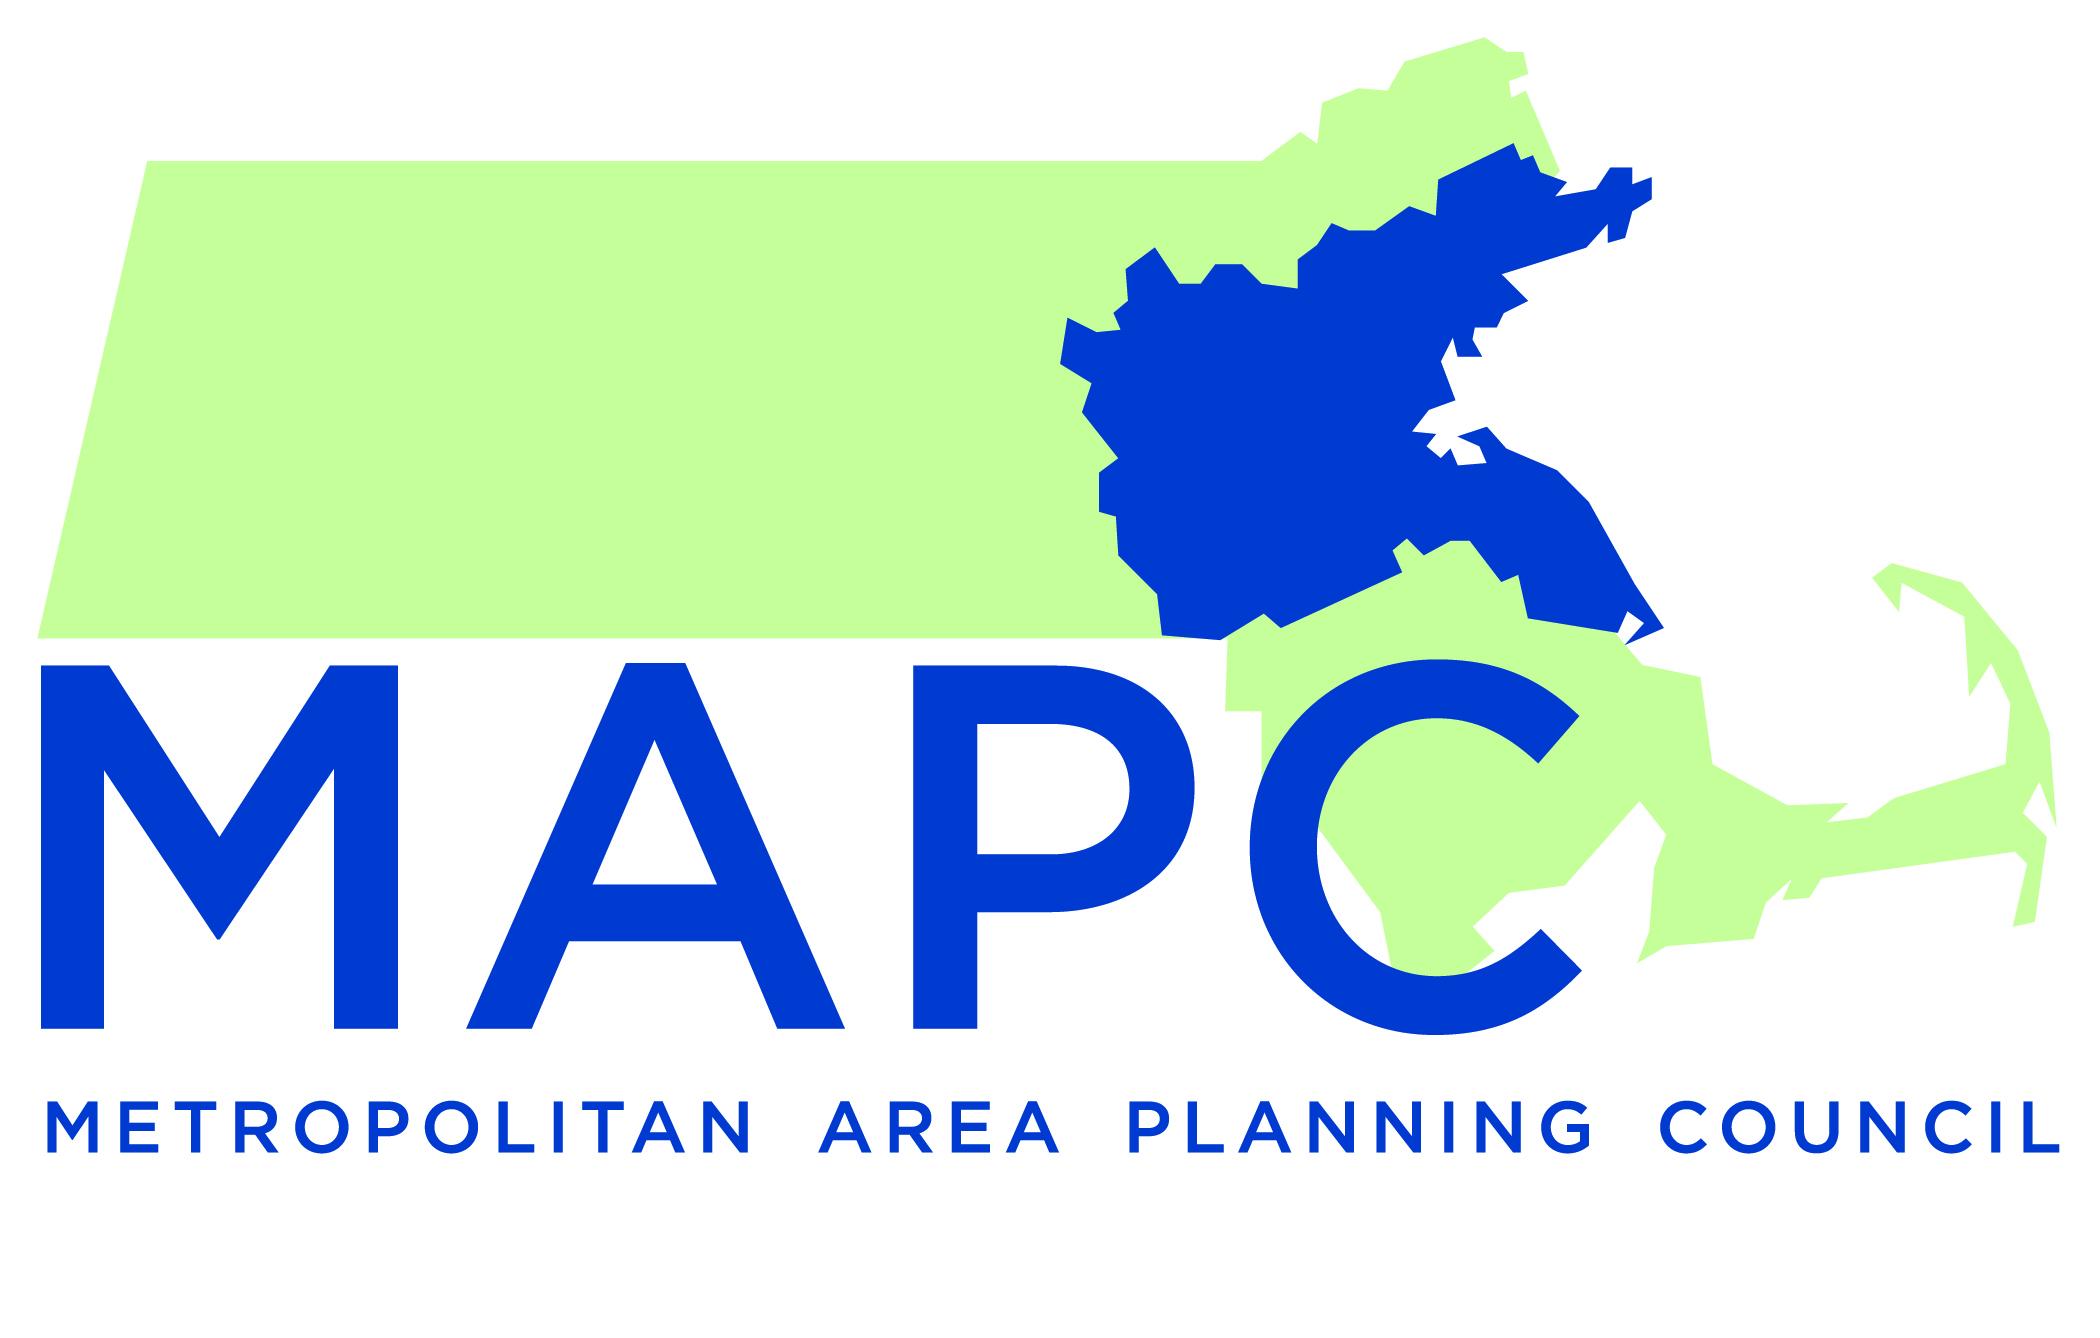 MAPC_Logo-Name_CMYK.jpg